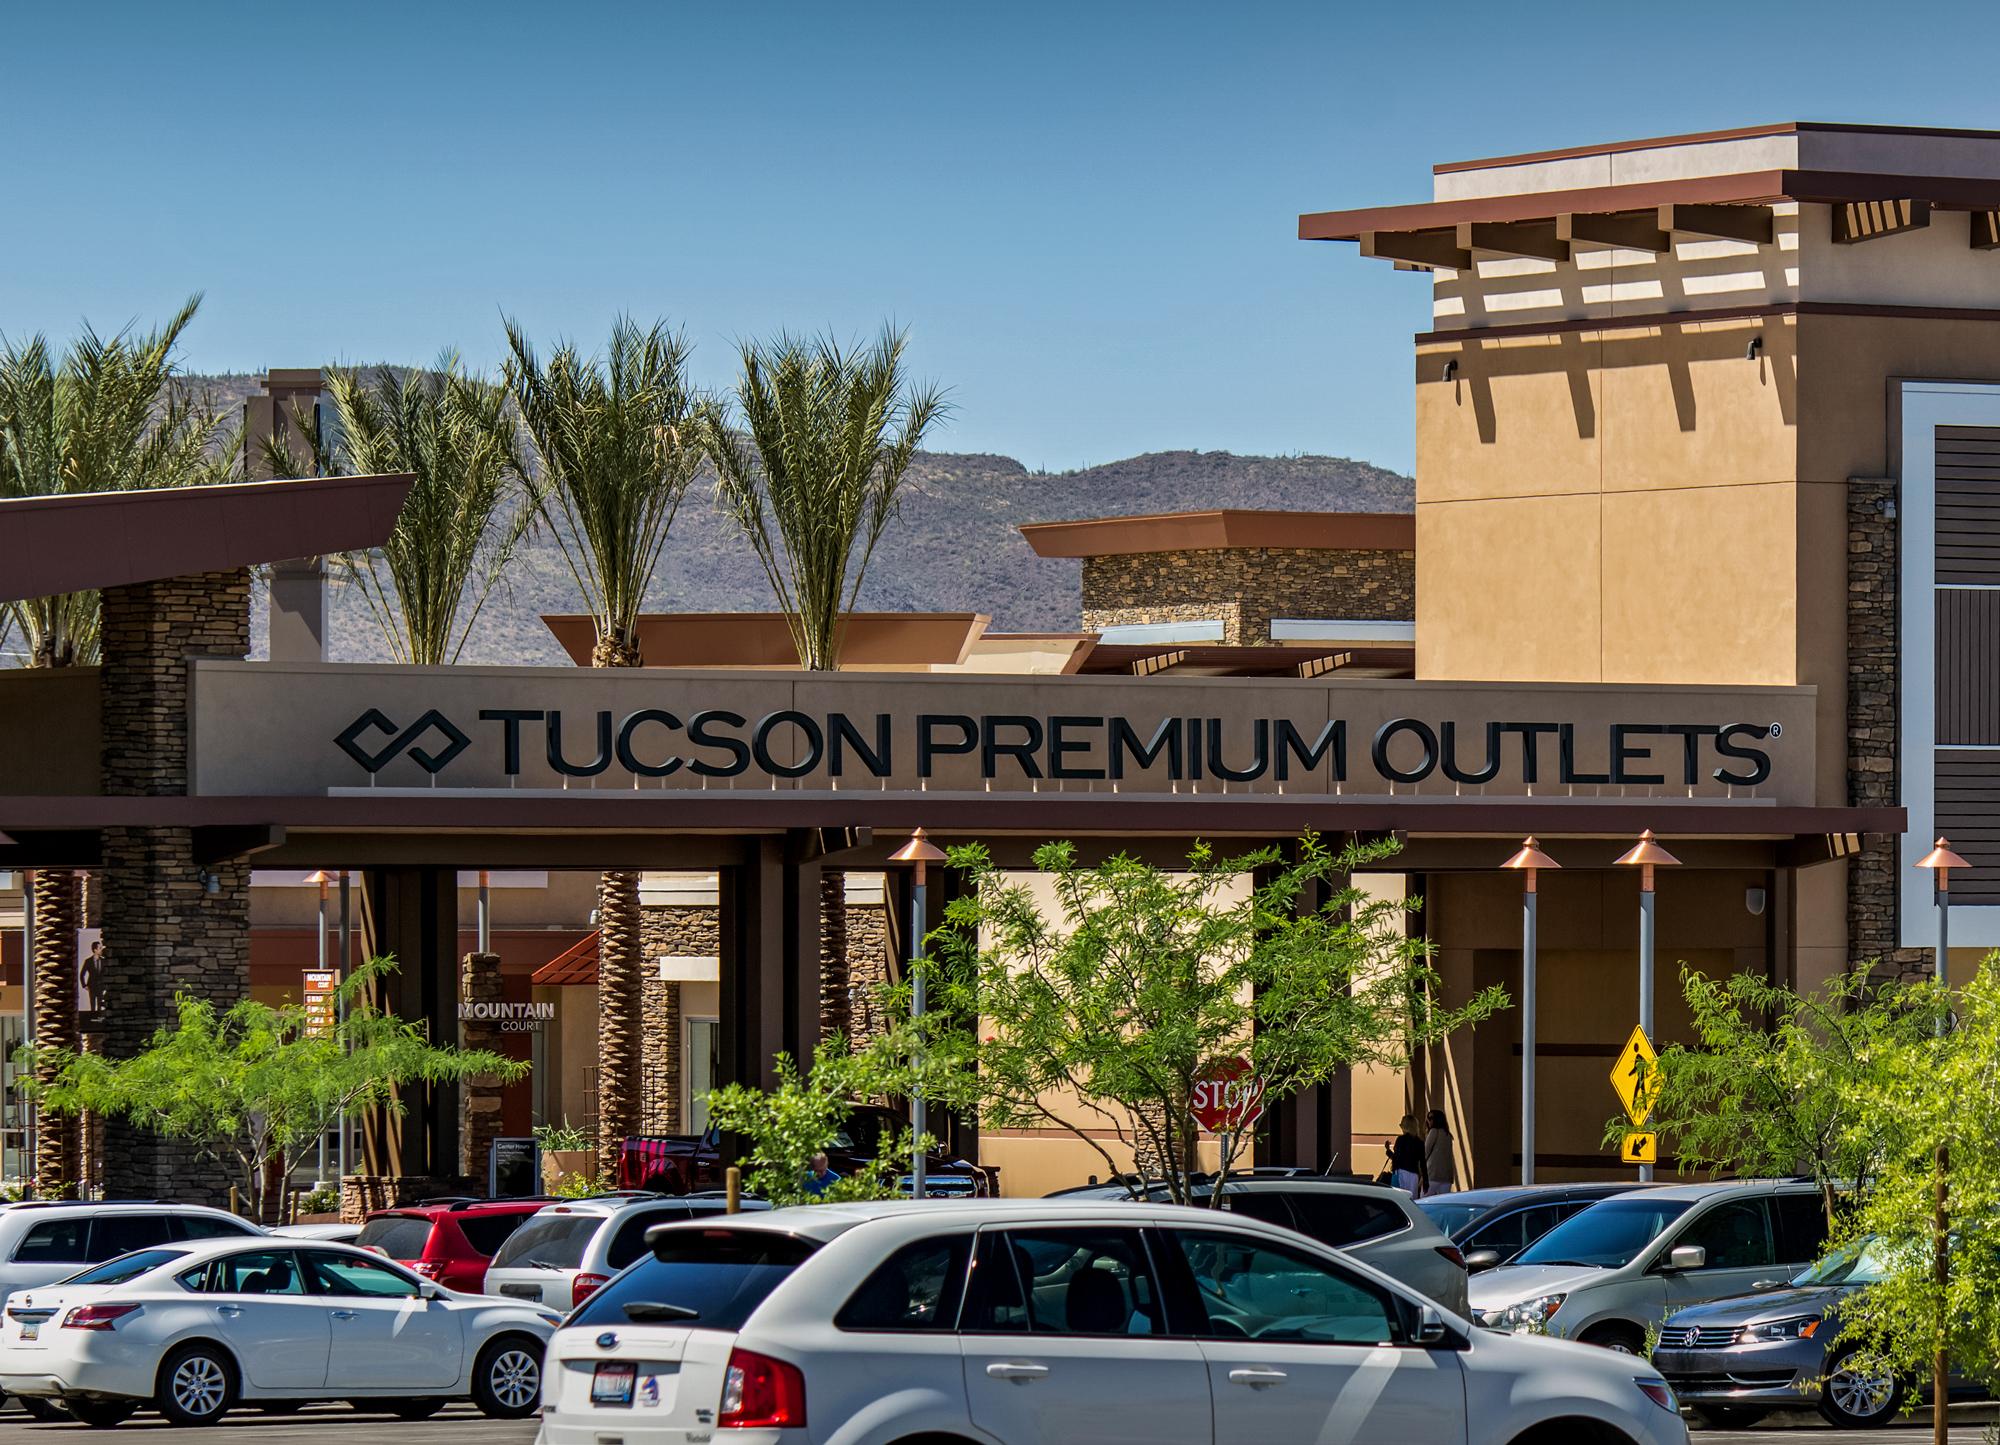 Tucson Premium Outlets Entry Sign